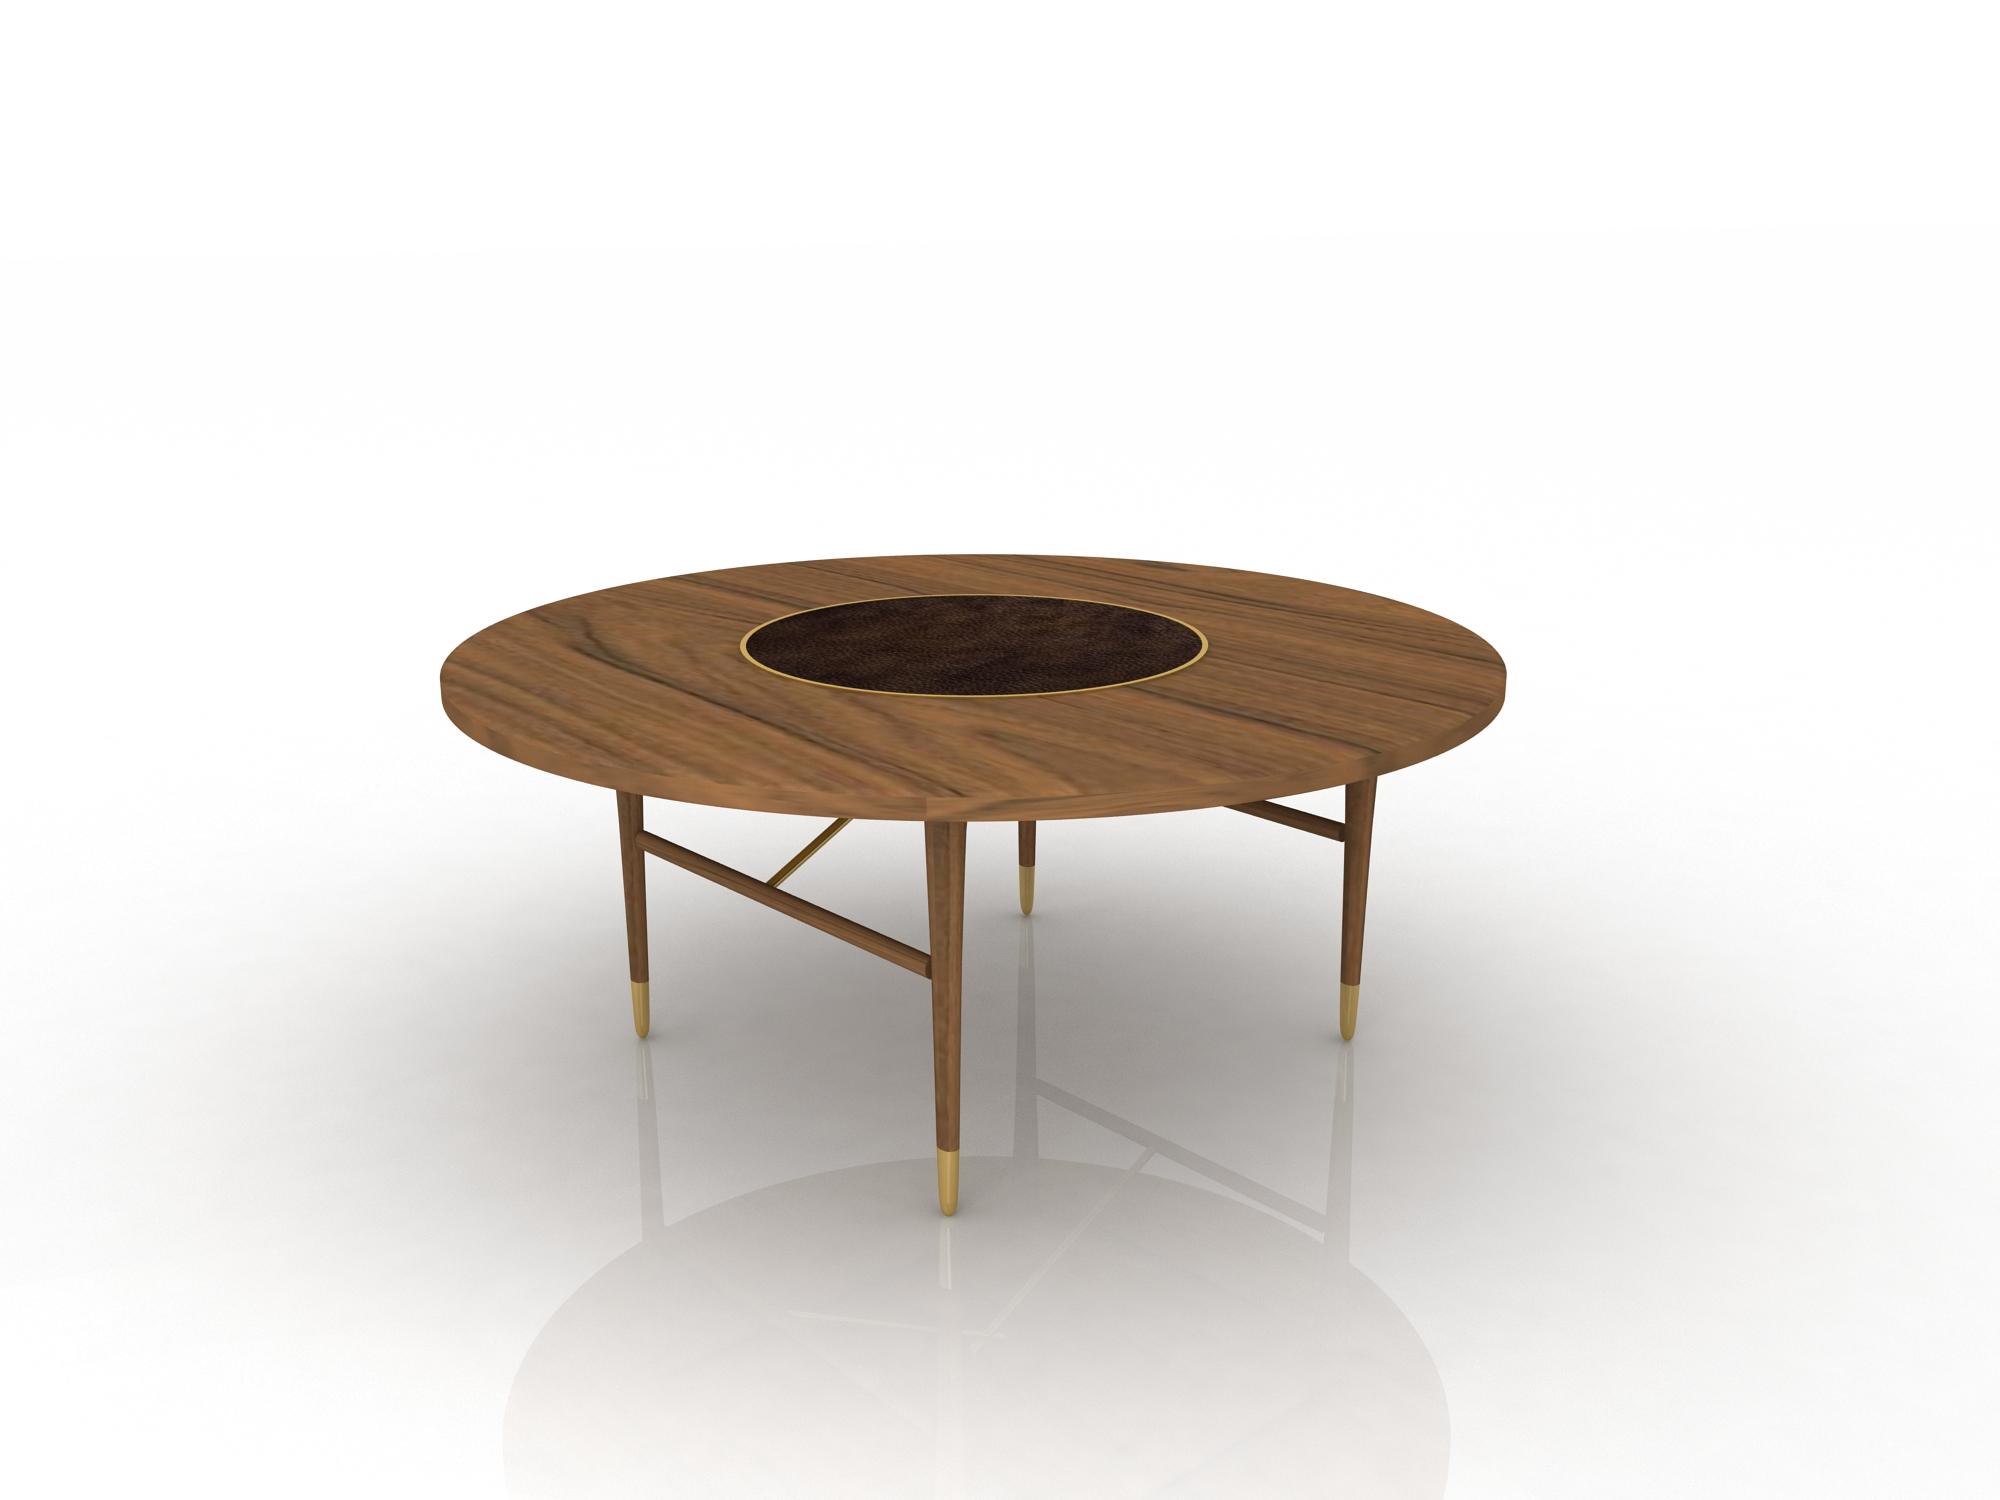 GI-08-COFFEE-TABLE-ROUND.jpg